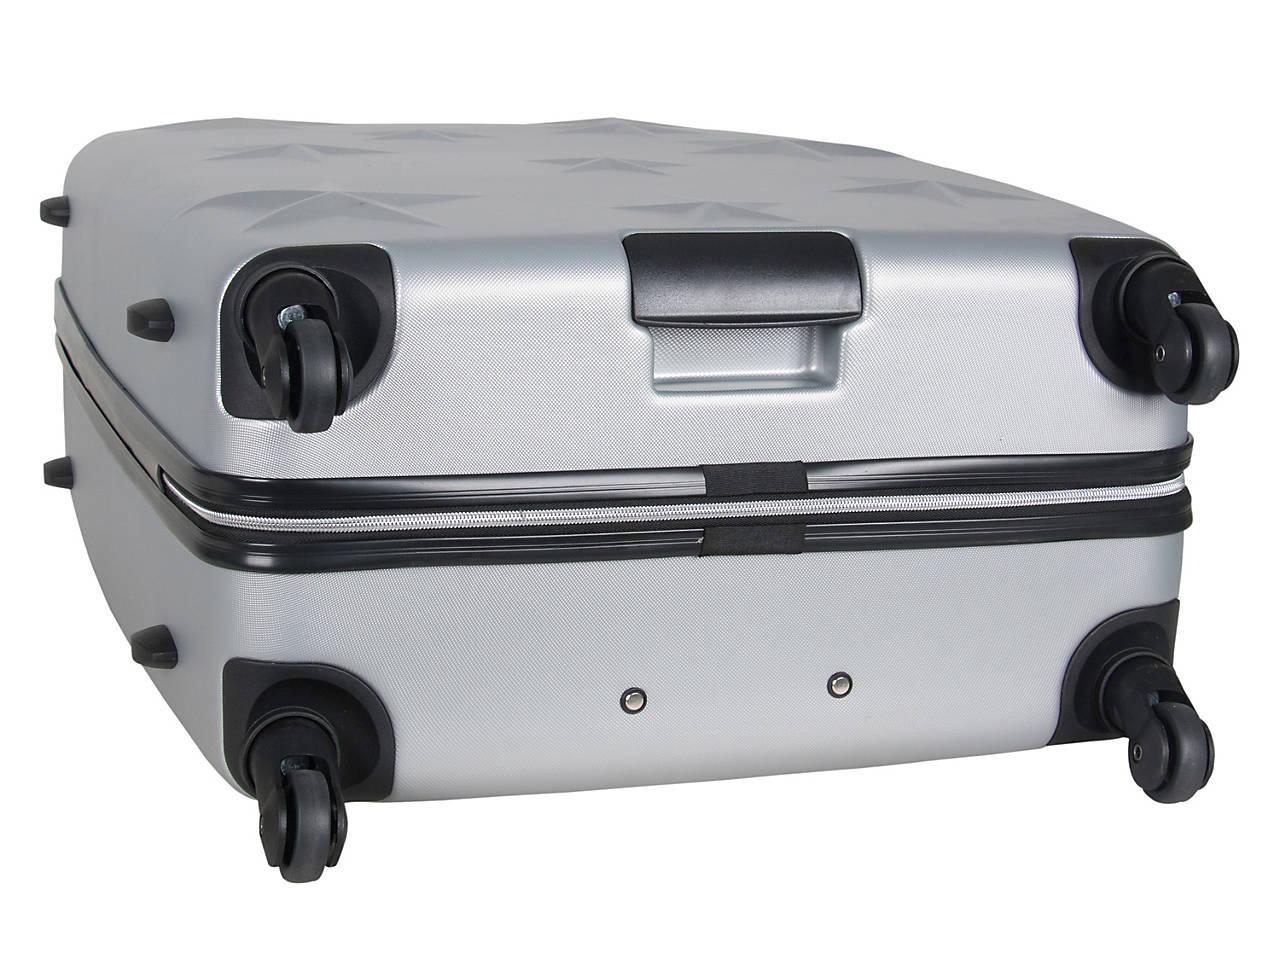 d53fbfb3c Aimee Kestenberg - Luggage Star Molded 28-Inch Checked Hard Shell ...